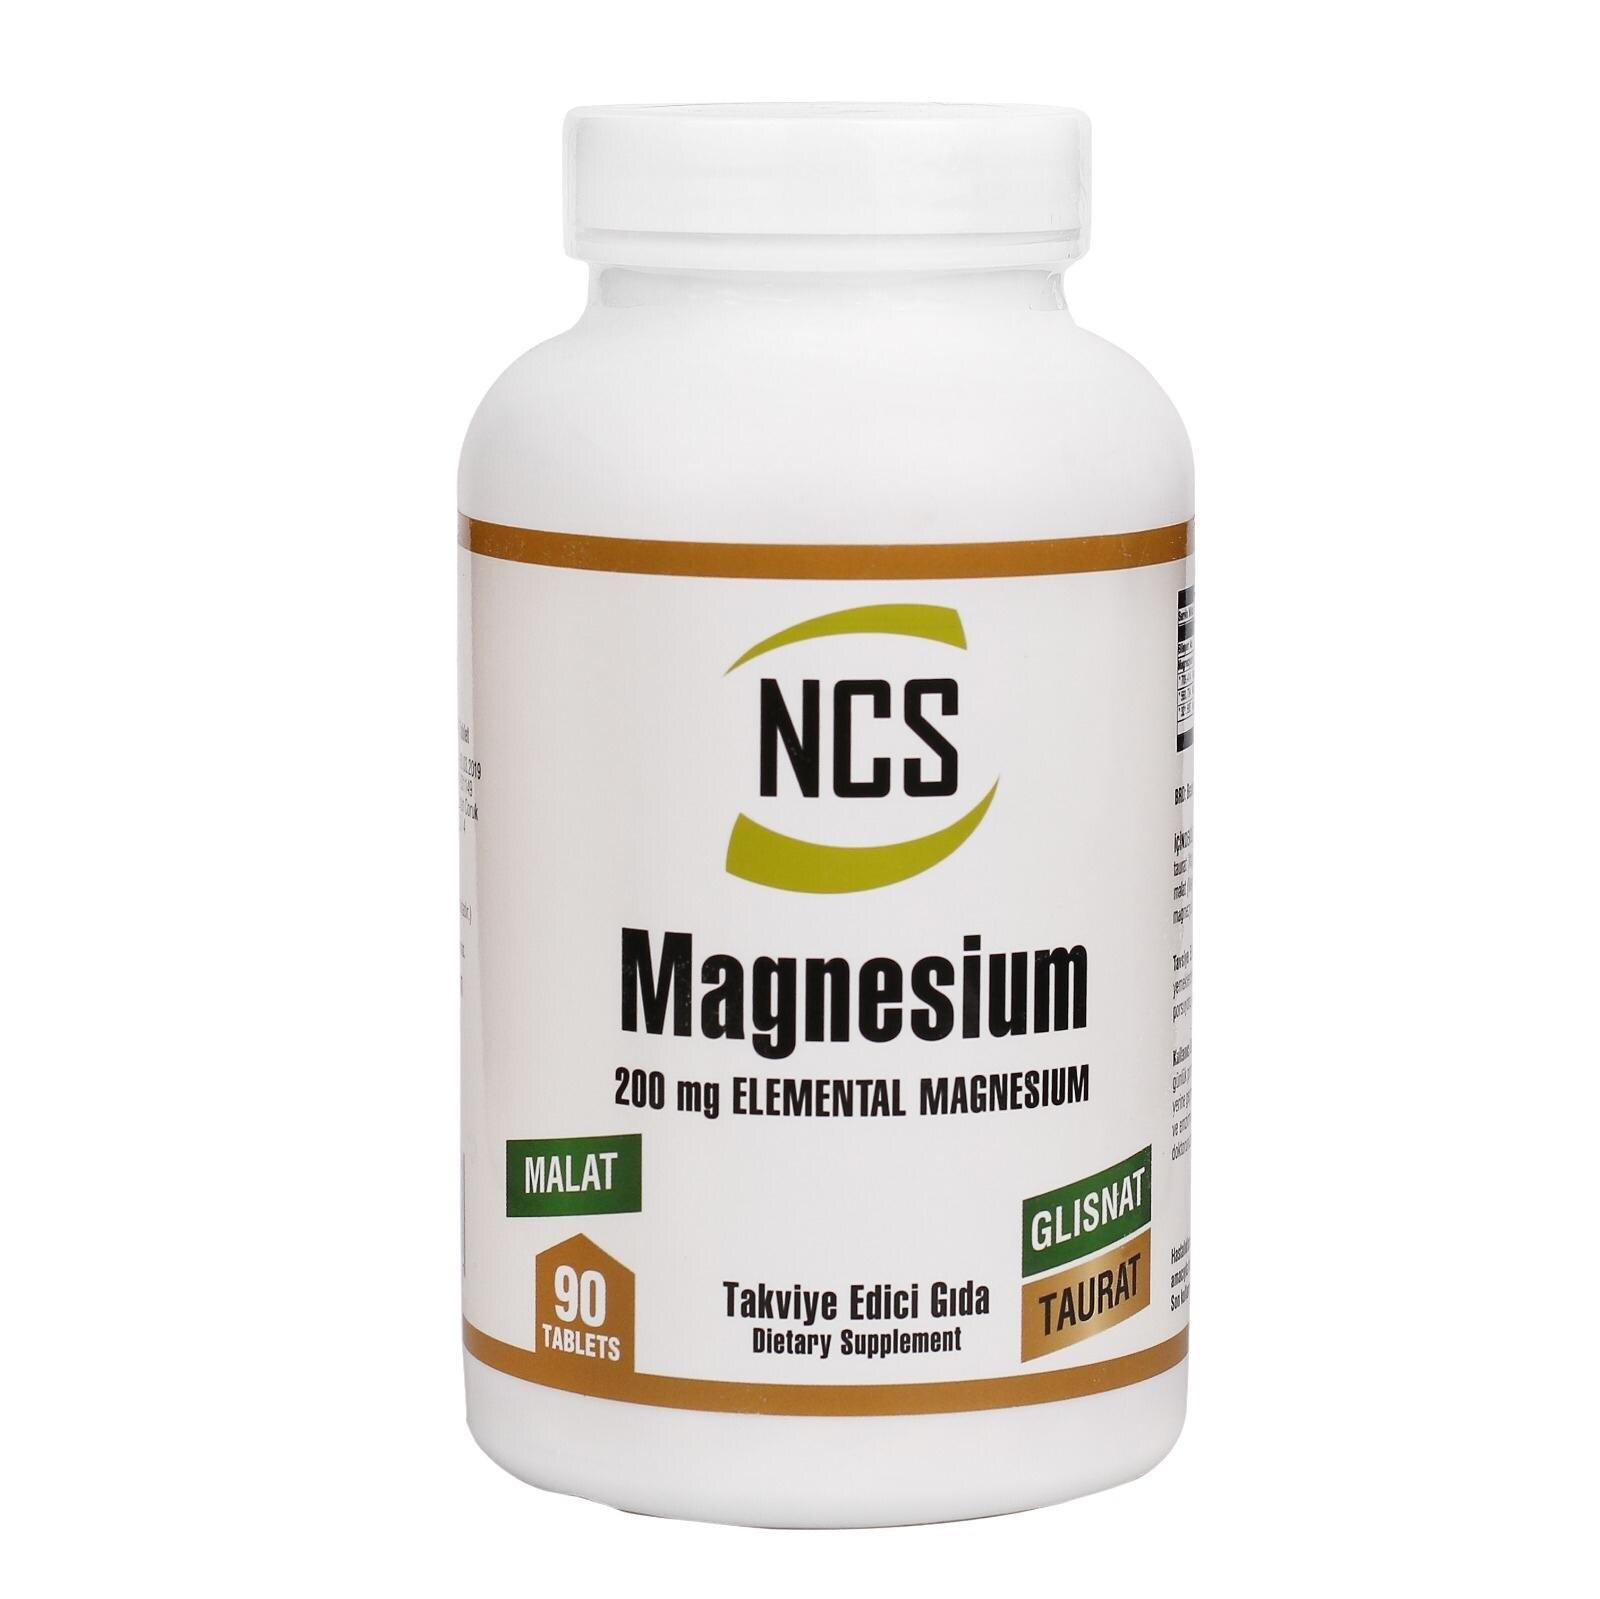 NCS Magnesium Malate Glisinat Taurat 90 Tablet